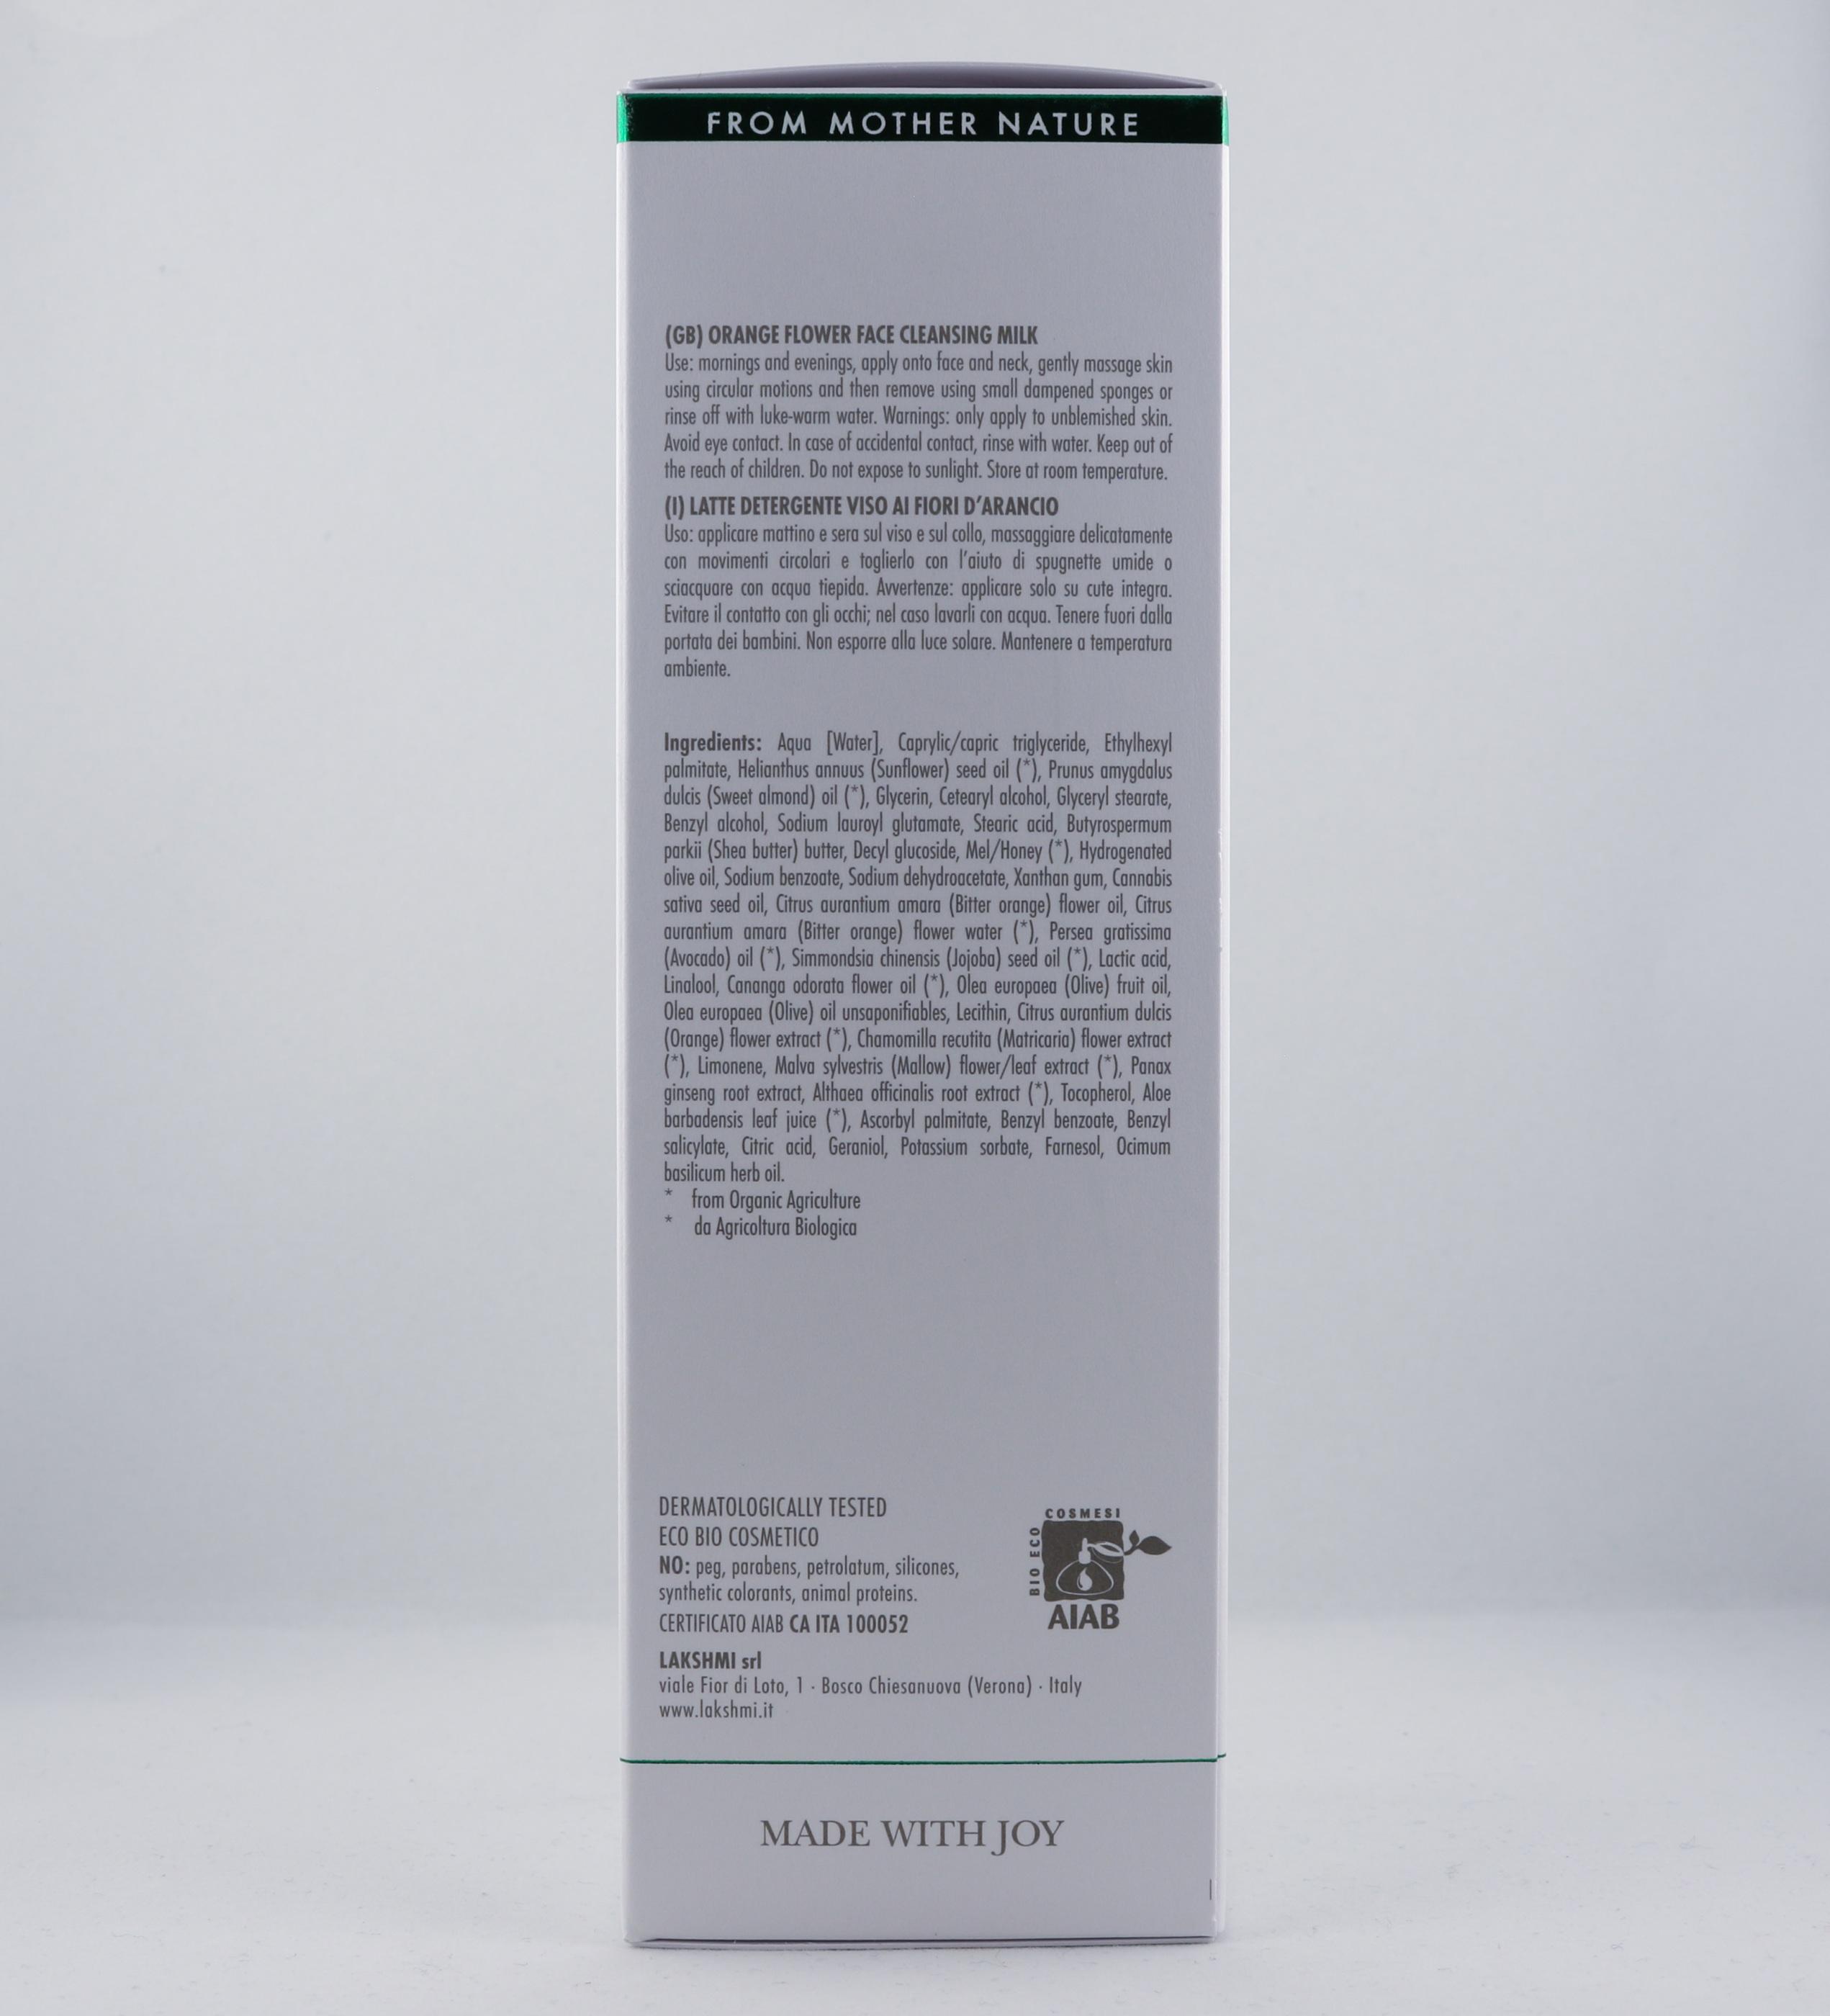 Vata Orange Flower Face Cleansing Milk hudvårdsprodukt hudvårdstyp alternativ hälsa wellness ayurveda hudvårdsprodukter